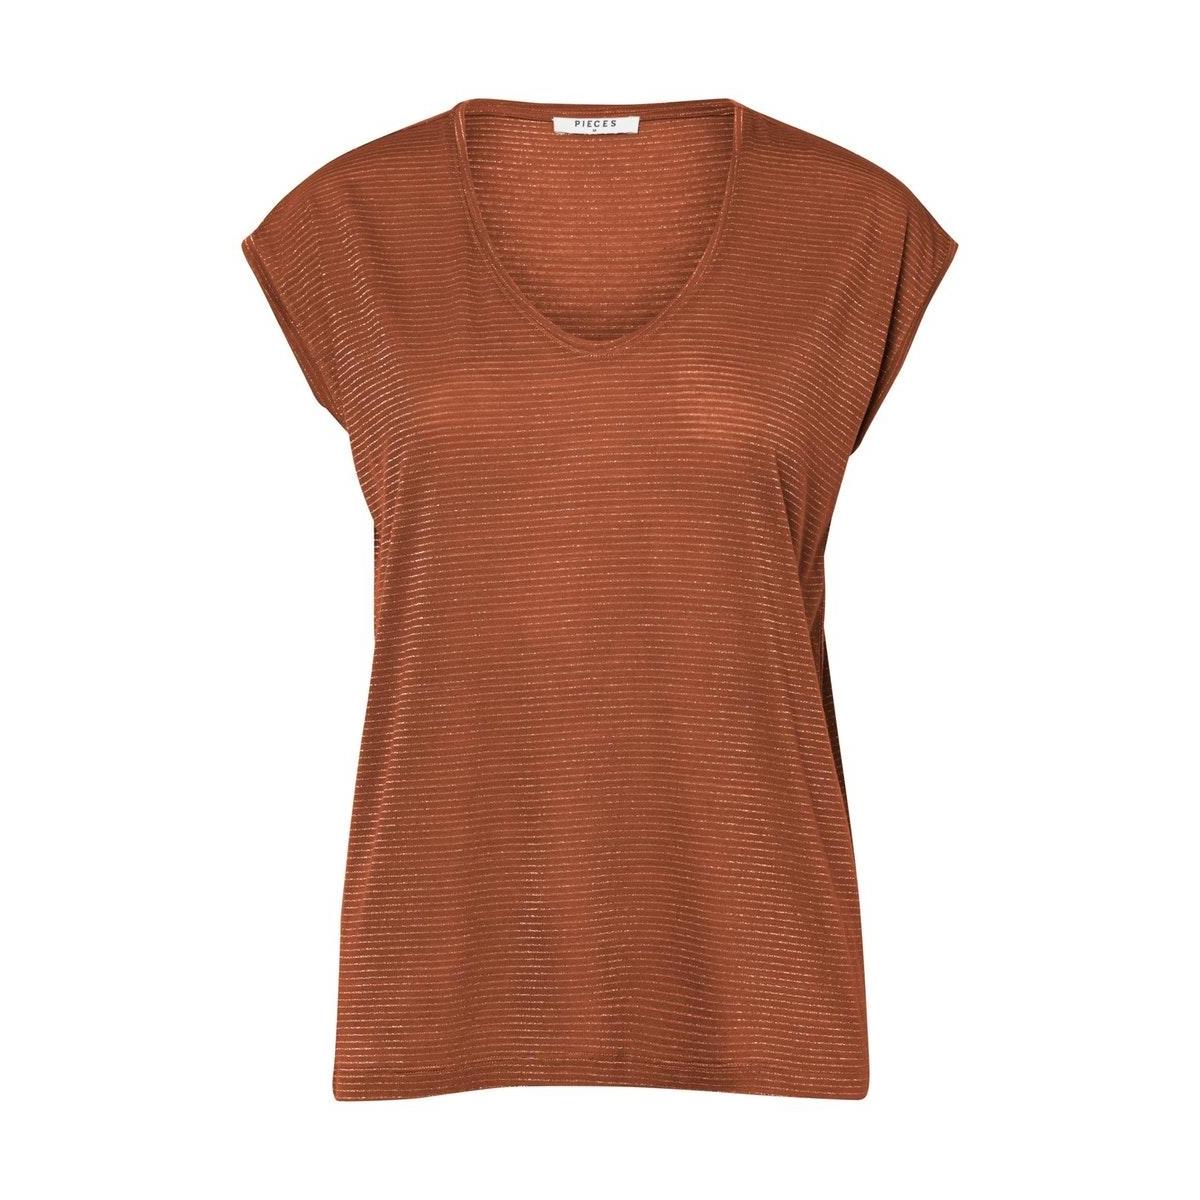 pcbillo tee lurex stripes noos 17078572 pieces t-shirt mocha bisque/gold lurex